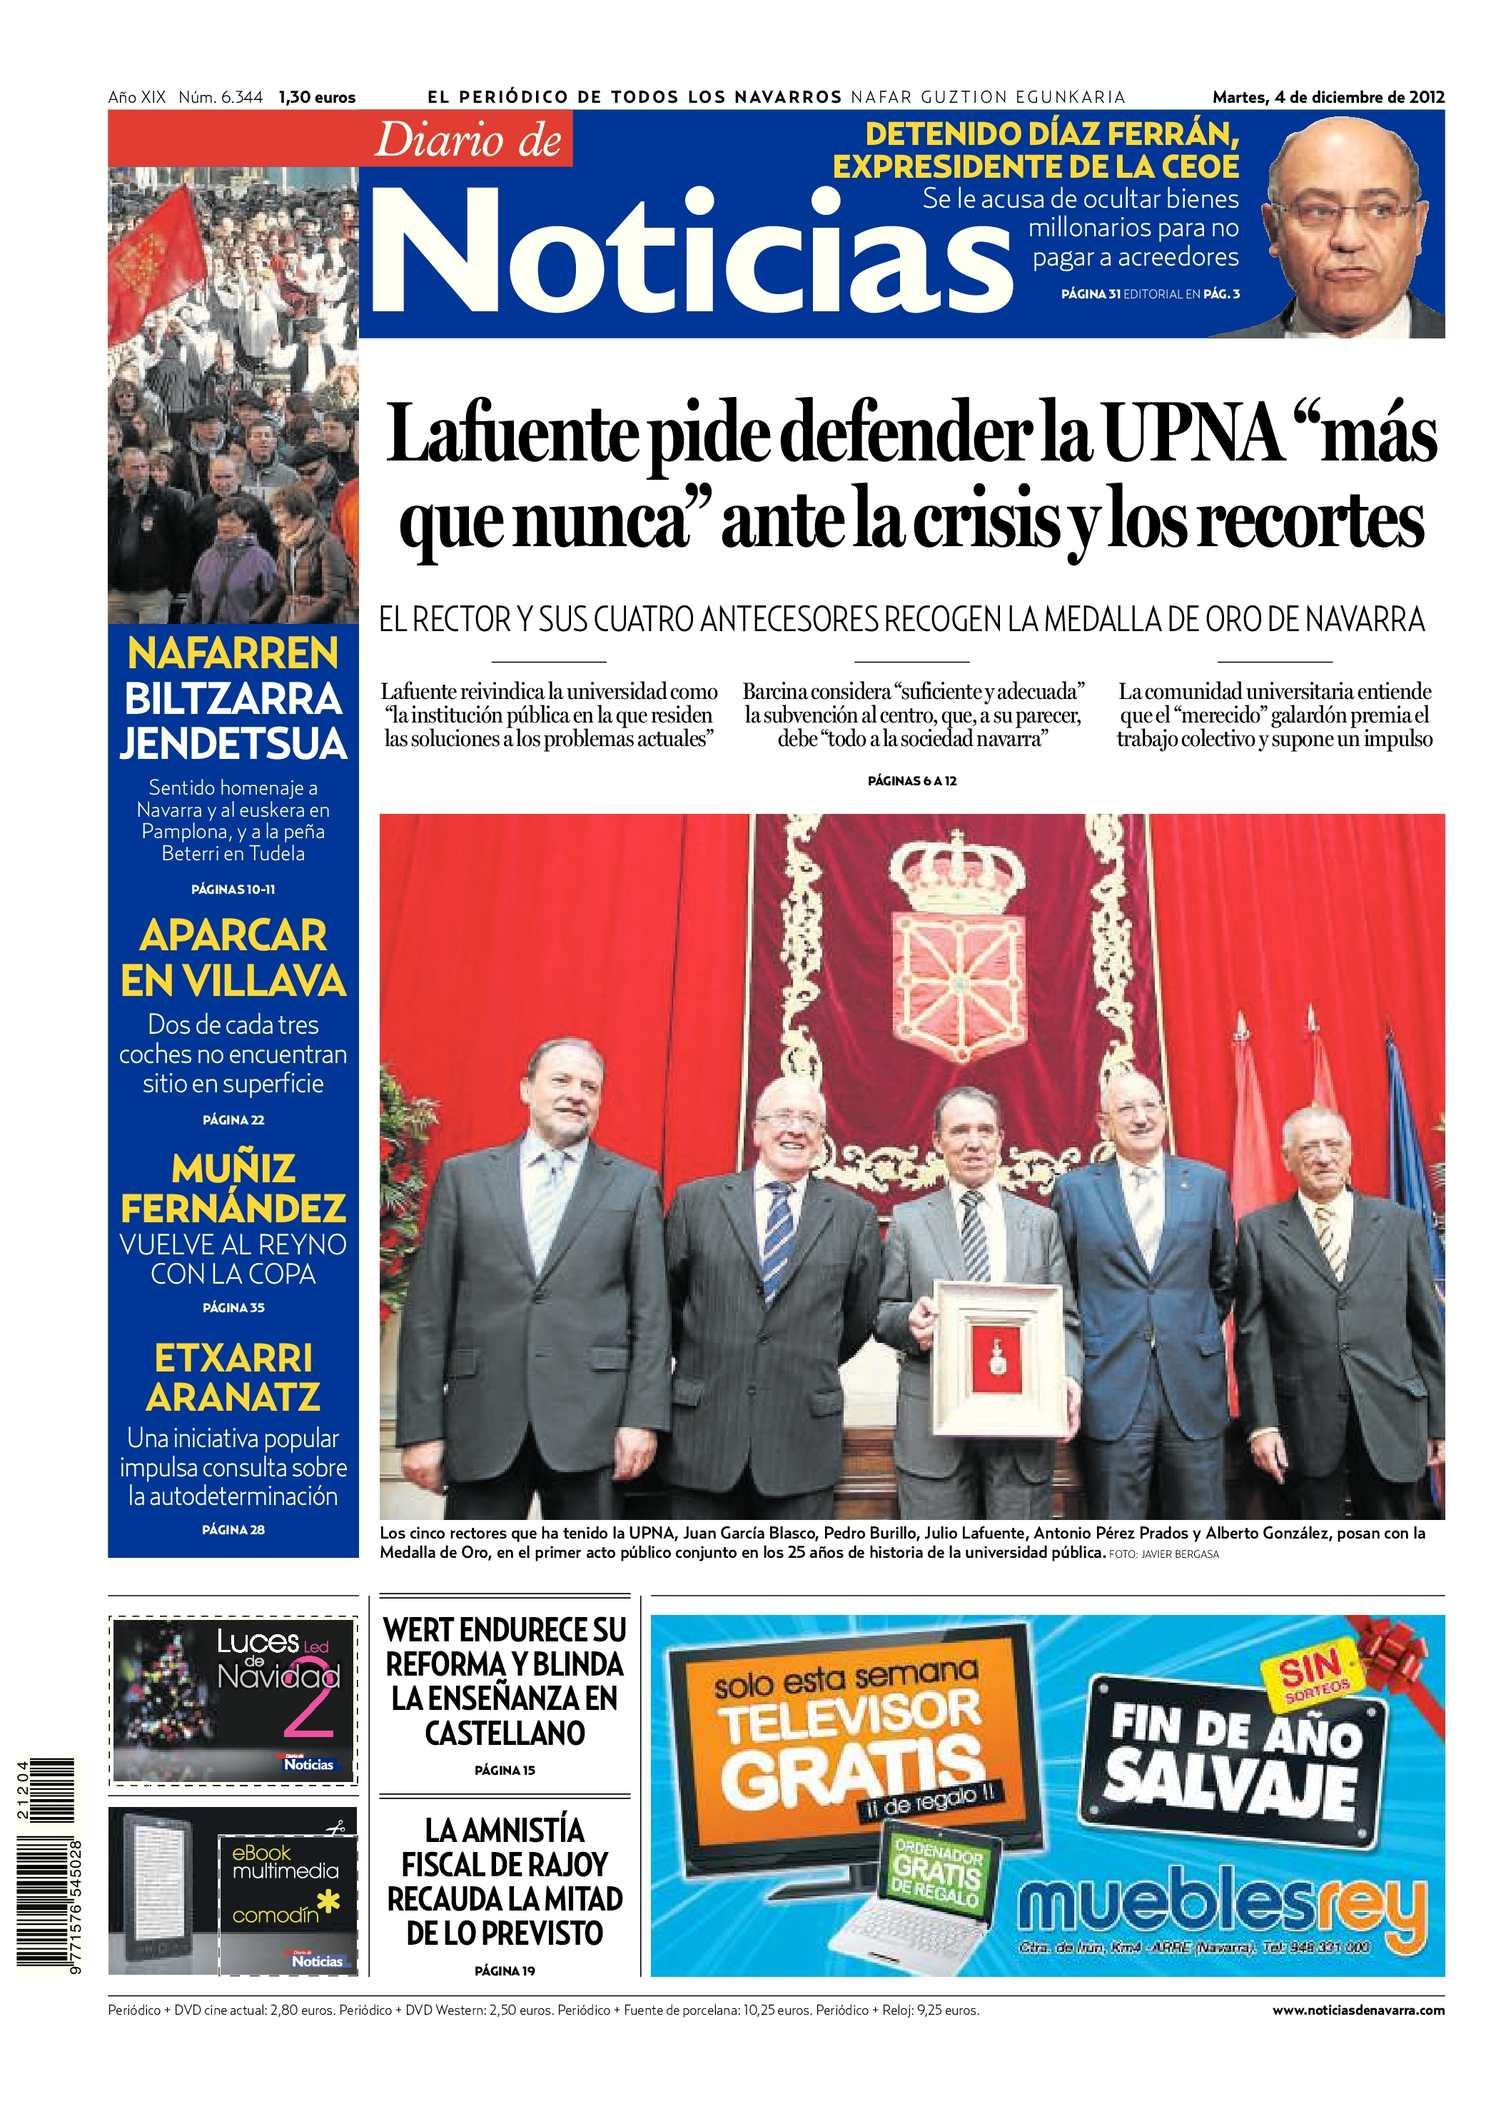 Calaméo - Diario de Noticias 20121204 c805ffd9c65d